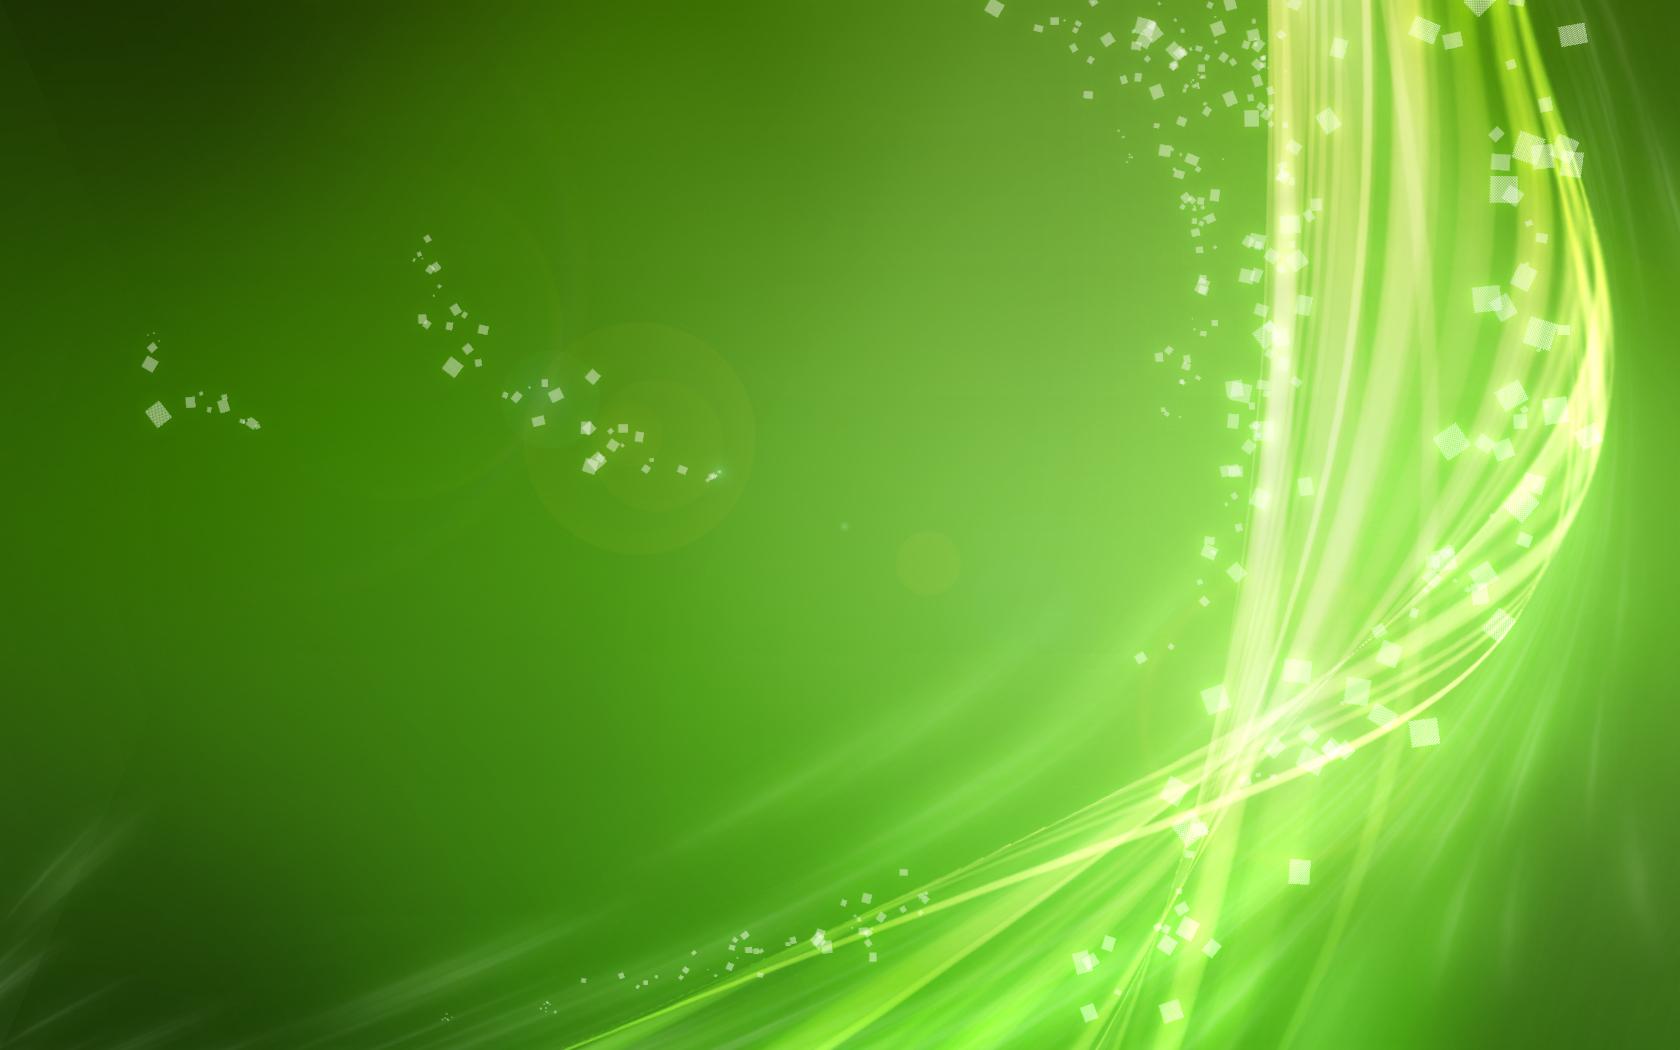 Green Wallpapers HD Pics 6821 Wallpaper Cool Walldiskpapercom 1680x1050